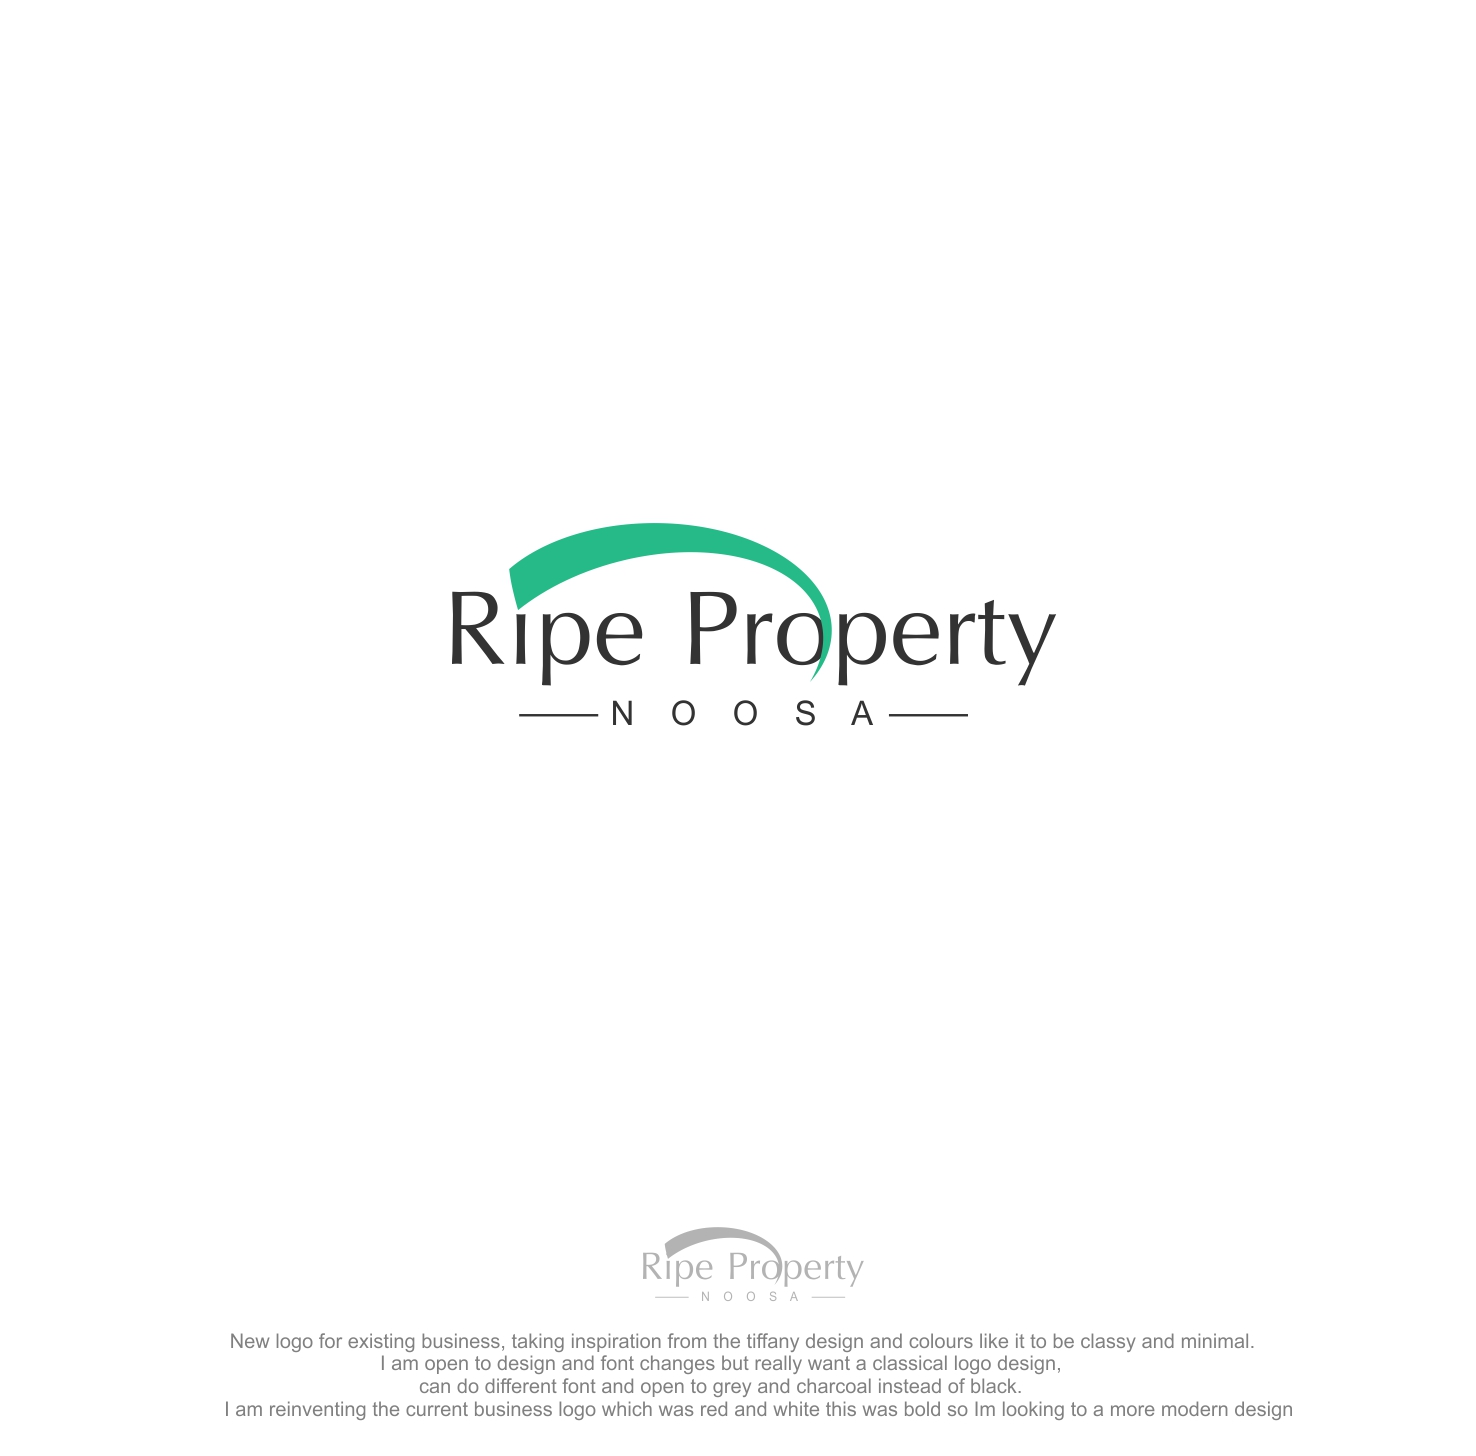 Elegant Serious Real Estate Agent Logo Design For A Company In Australia